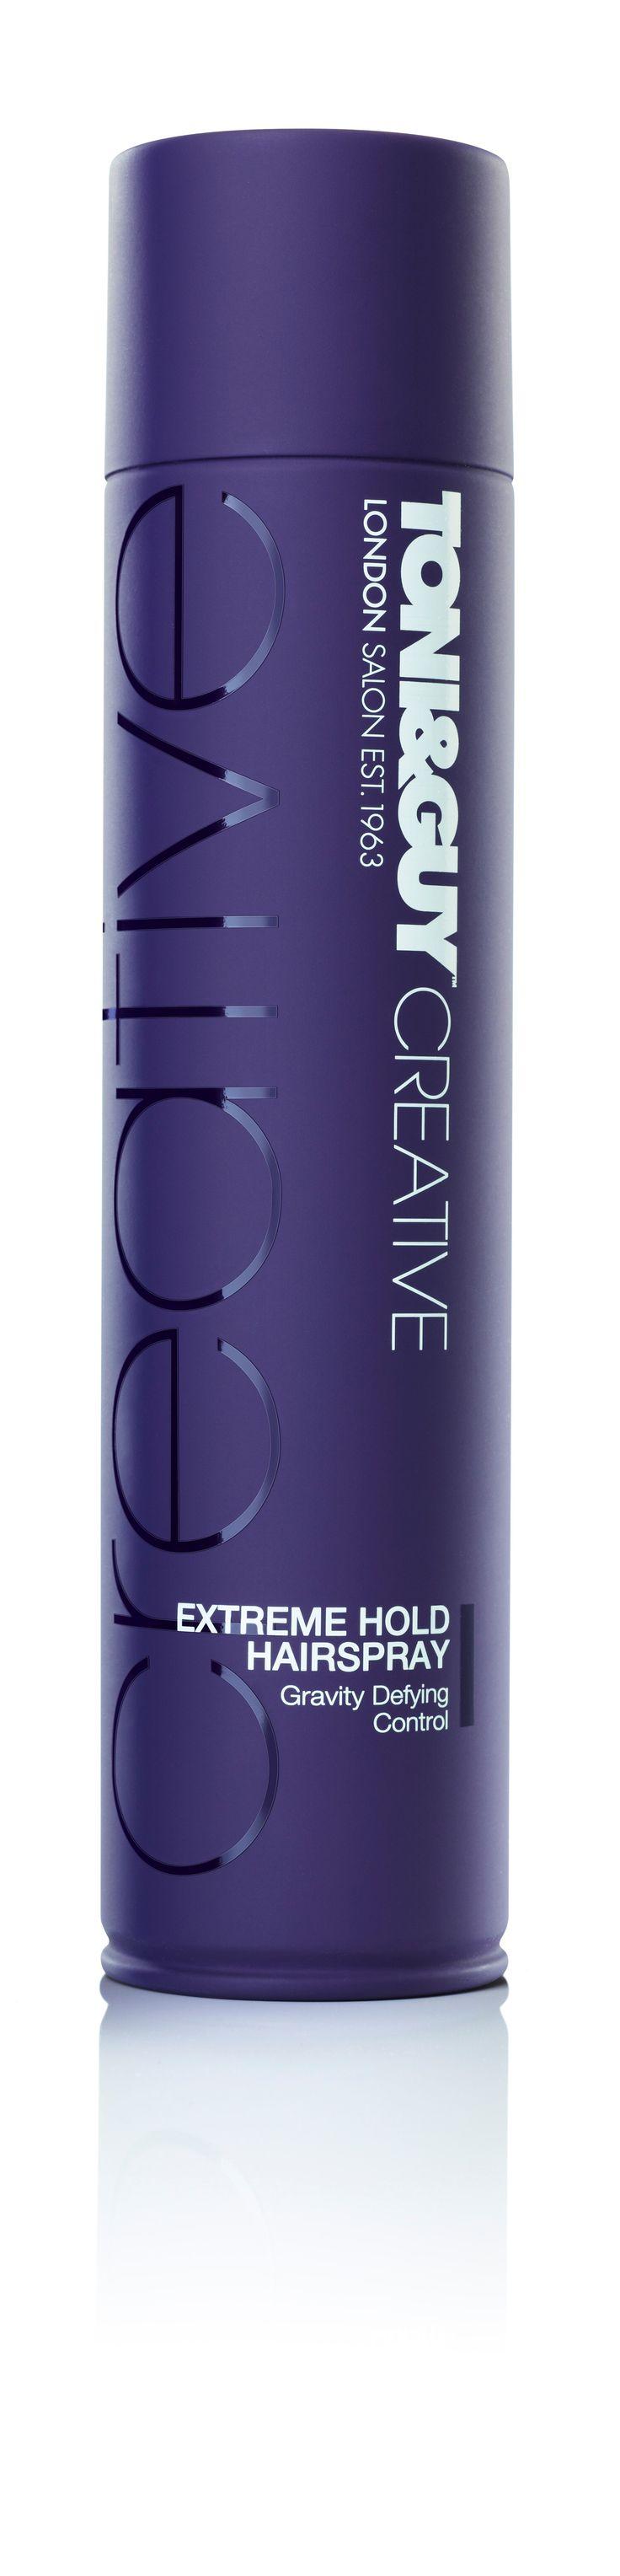 TONI&GUY Hair Care Creative Extreme Hold Hairspray RRP $9.99